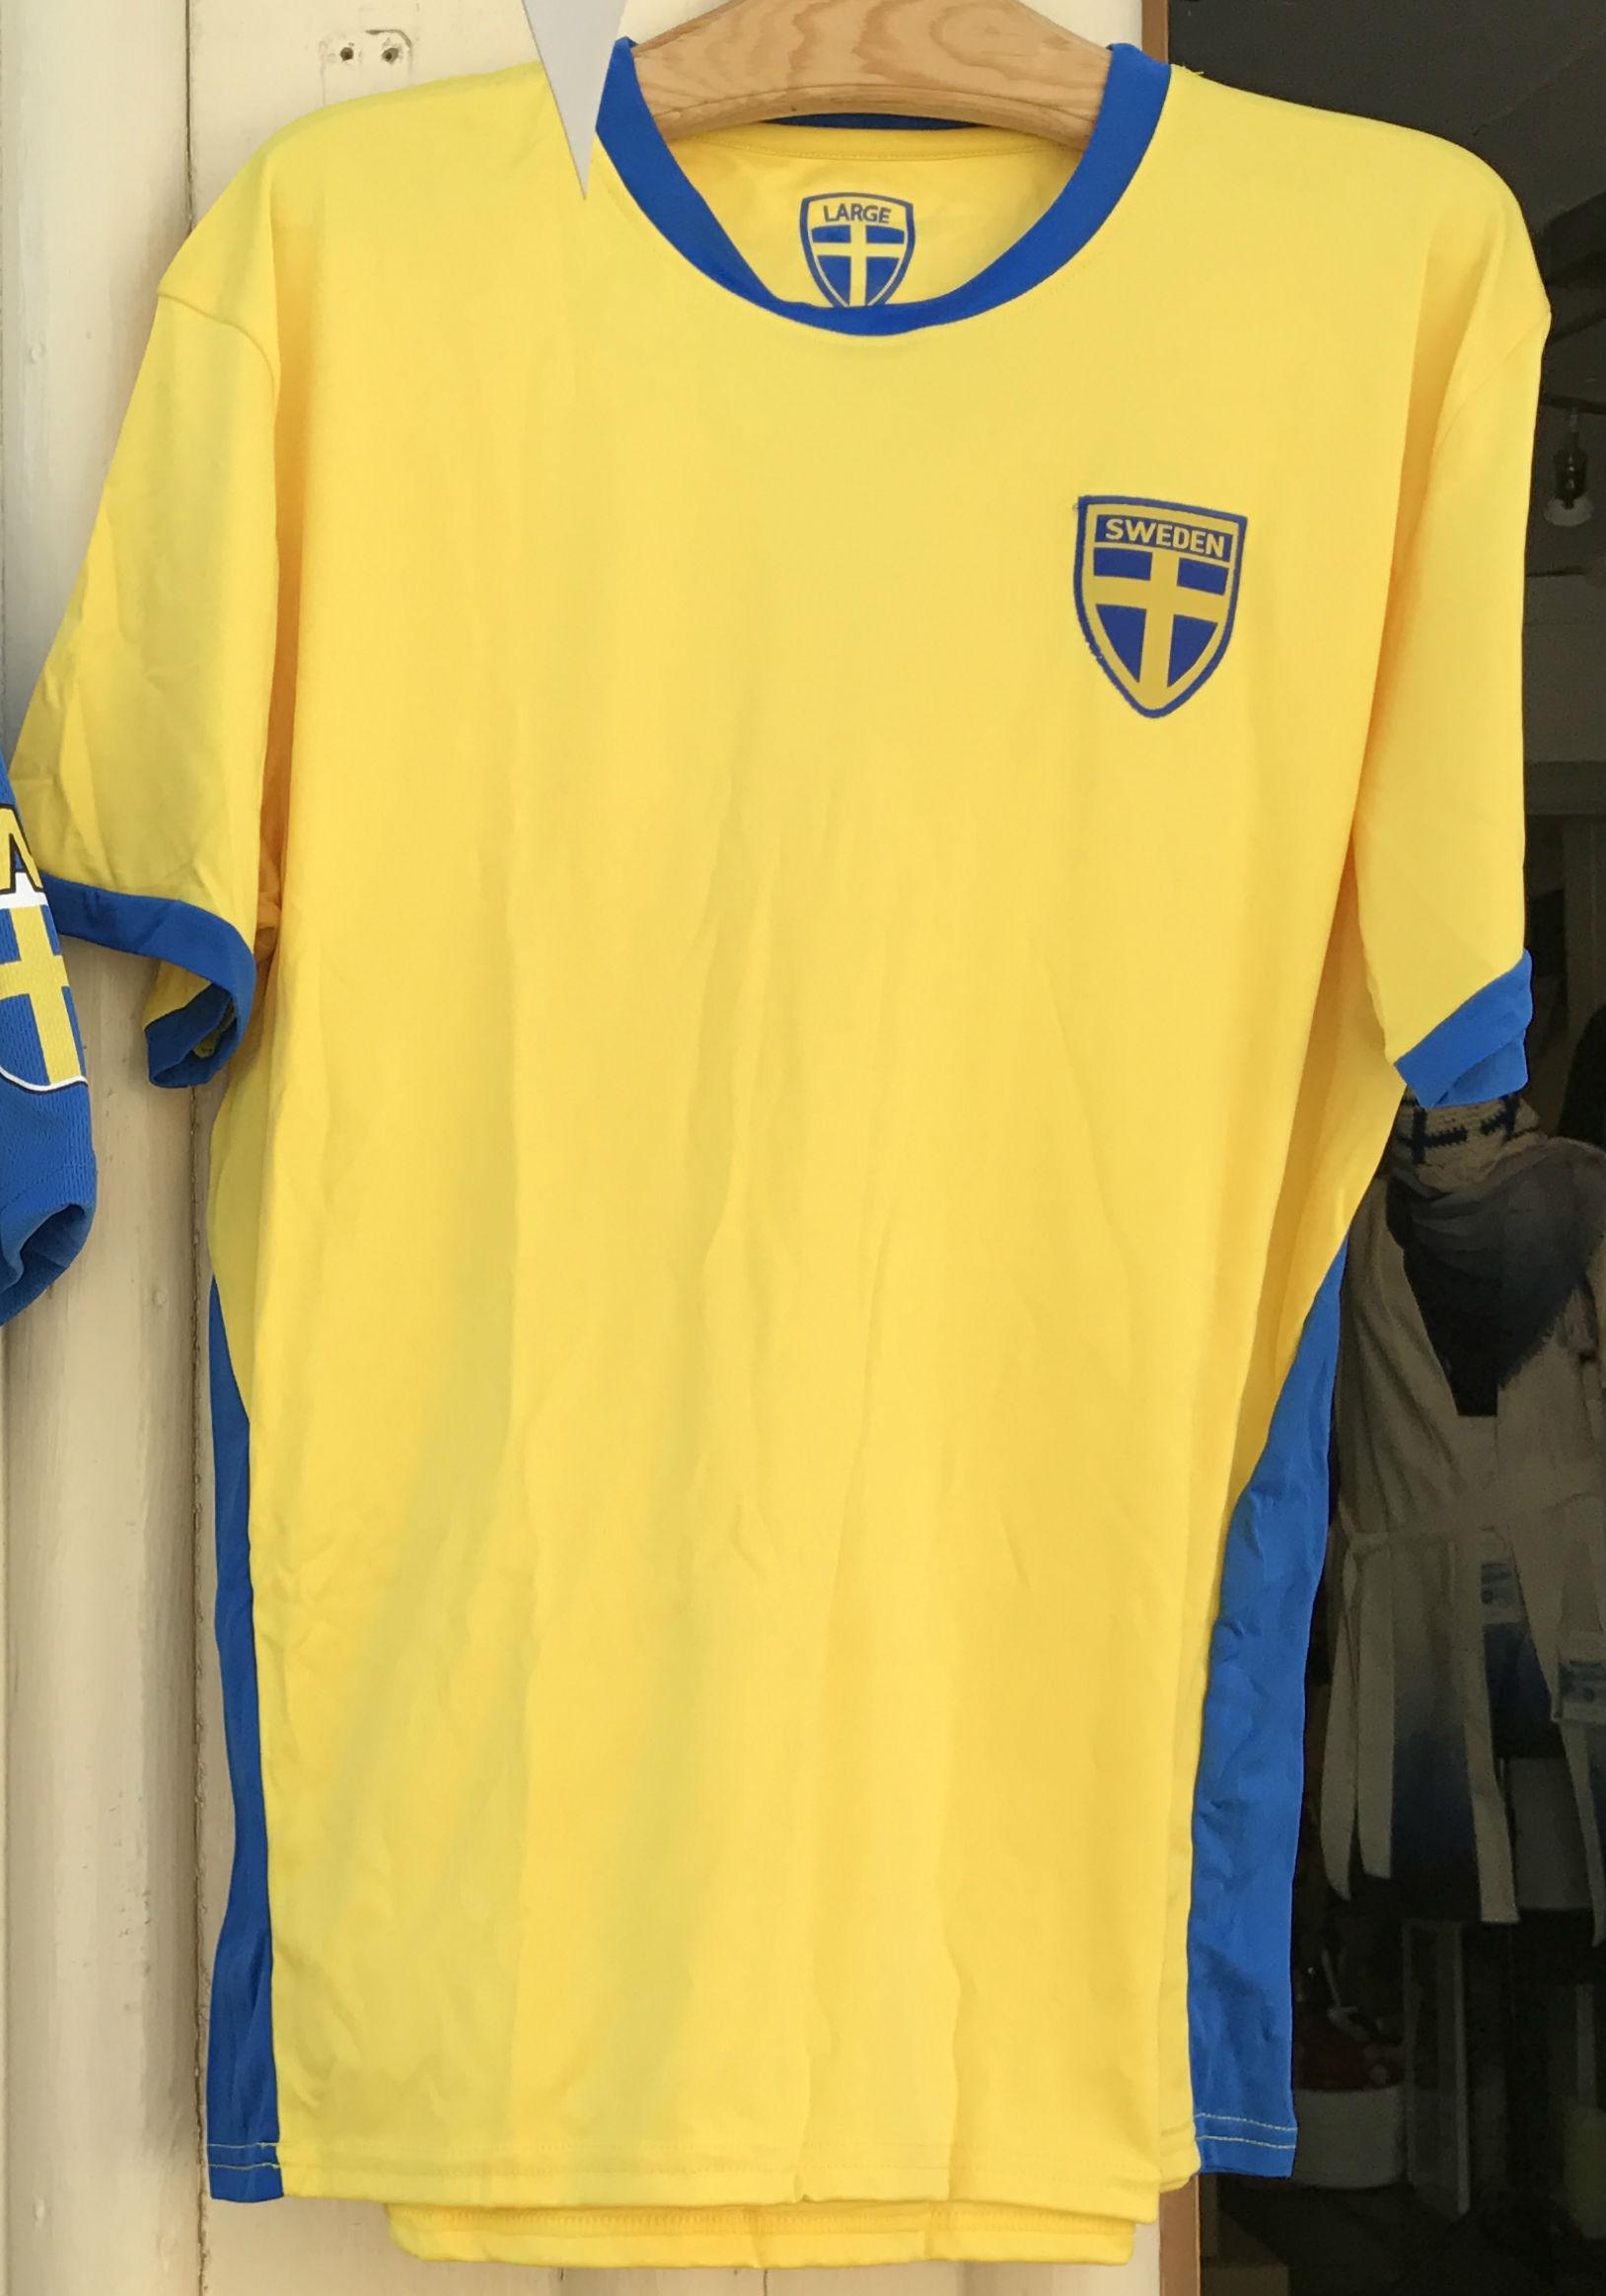 a1bbe2e00dbf Fotbolls tröja Sverige Vuxen - Sverigedräkter